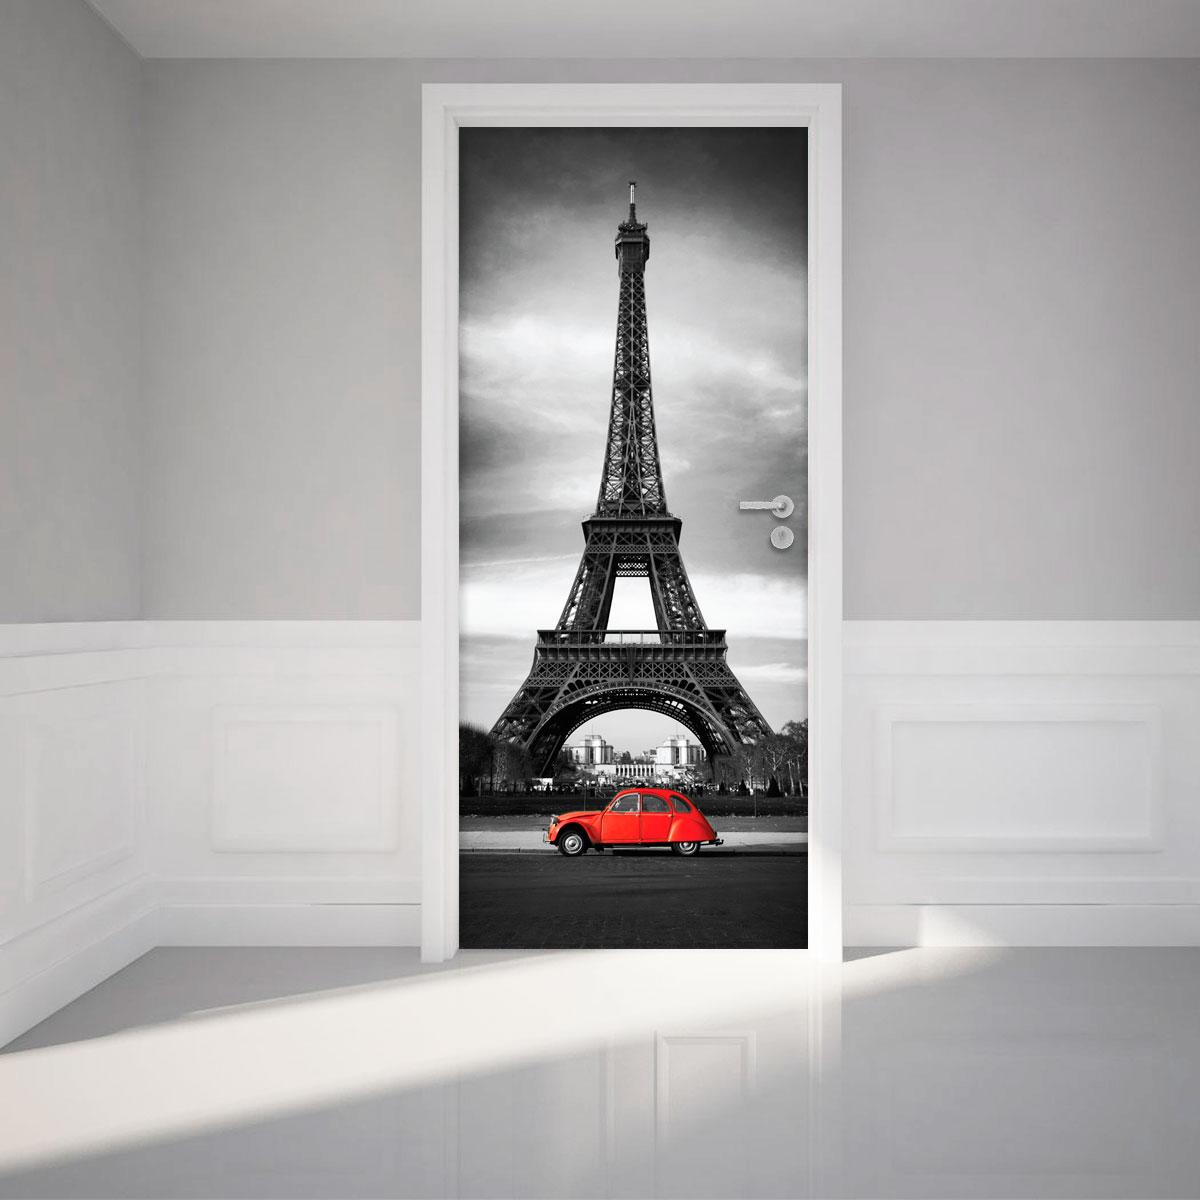 Stickers Per Porte.Sticker Porte 204 X 83 Cm Tour Eiffel